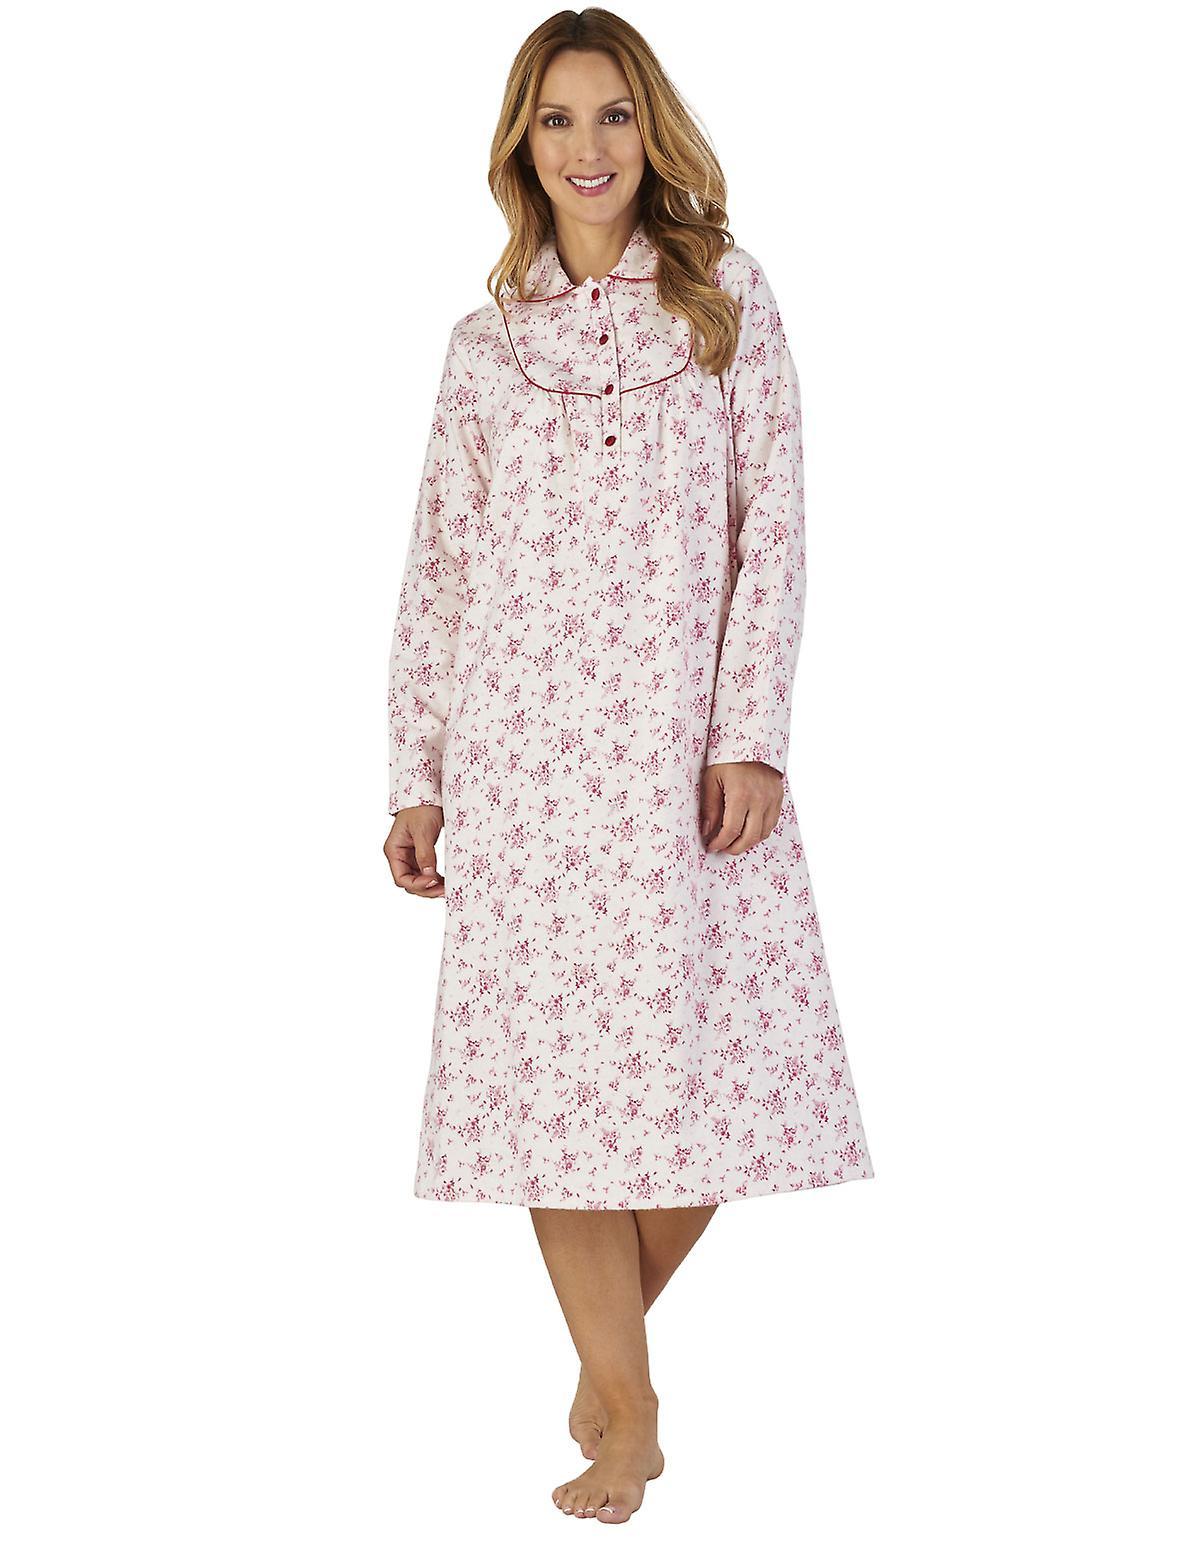 c55aba4a3c Slenderella ND2211 Women s Luxury Flannel Floral Night Gown Loungewear  Nightdress